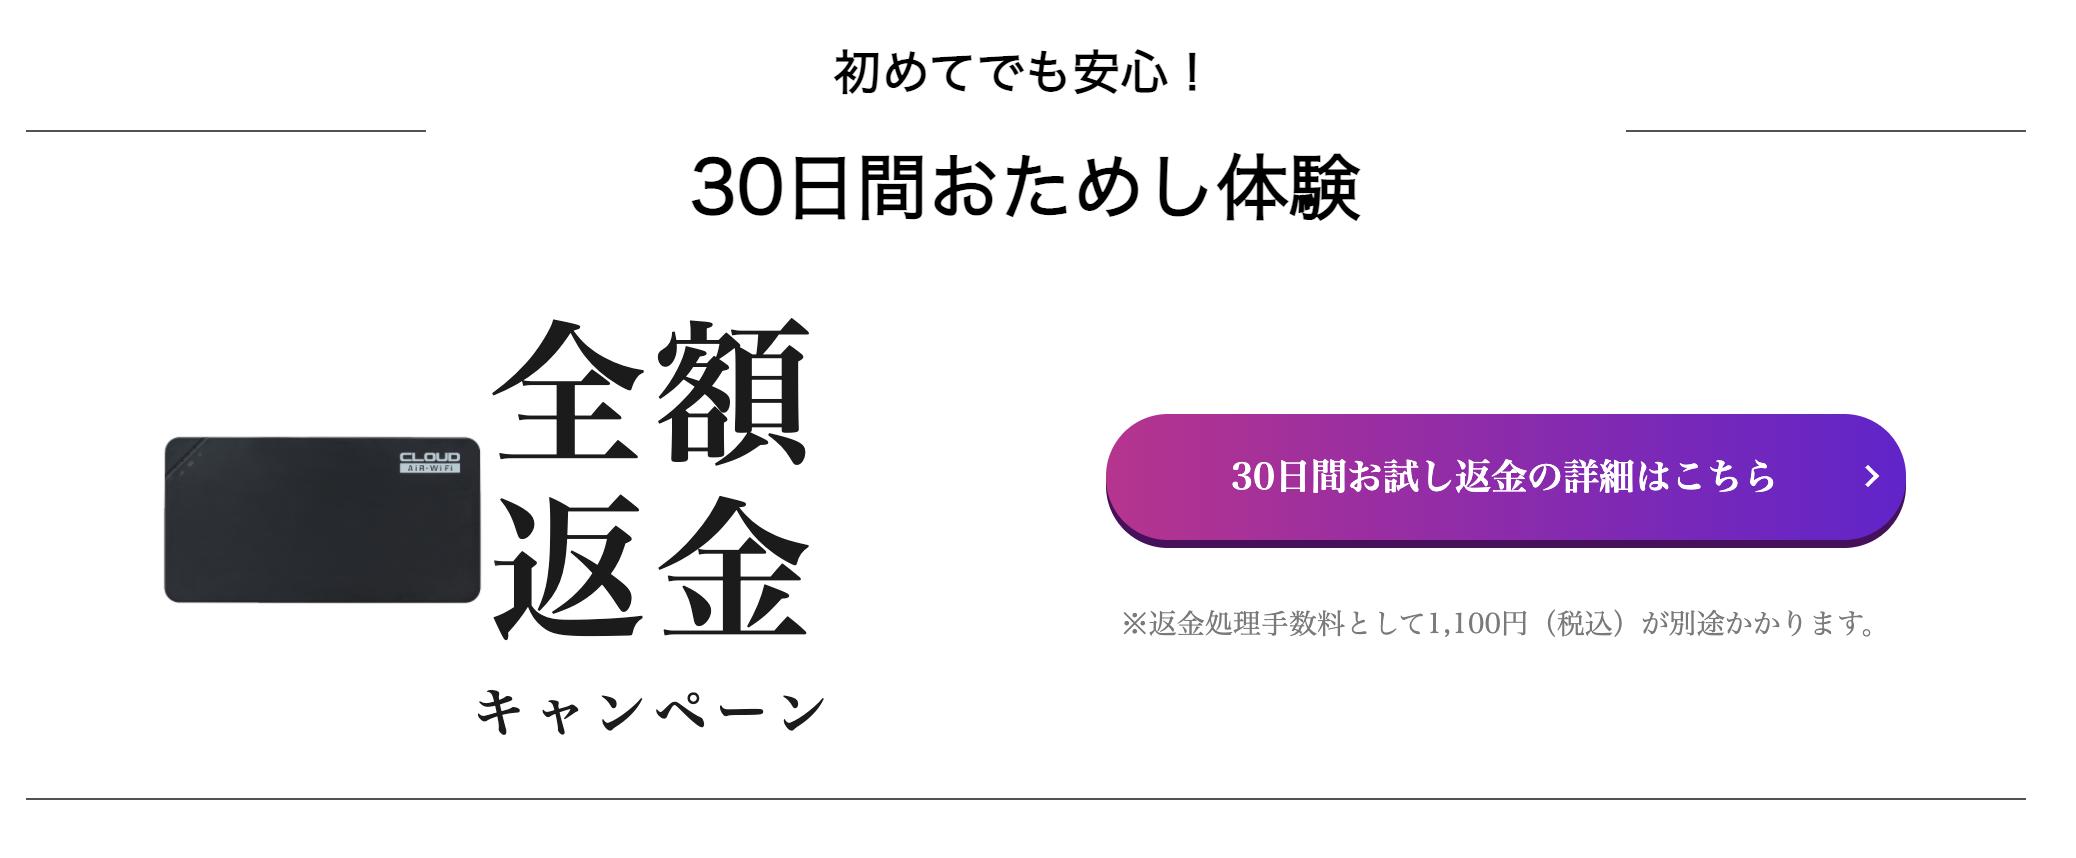 Mugen WiFi30日間おためし体験